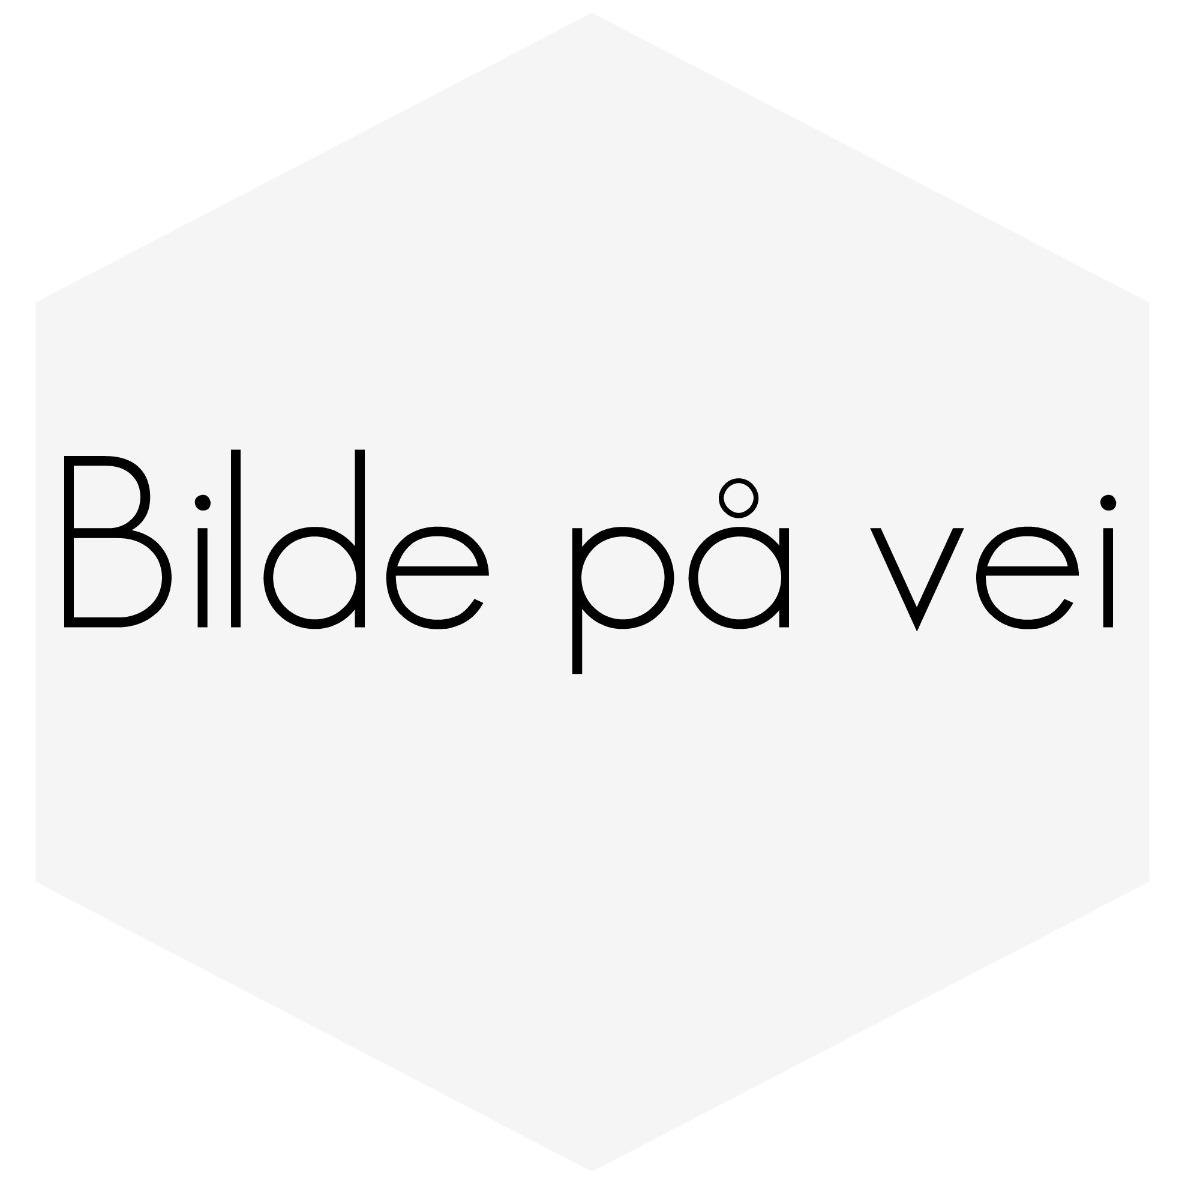 SPEIL PÅ DØR VOLVO 240/260 opp til 1985 VENSTRE EL JUST.